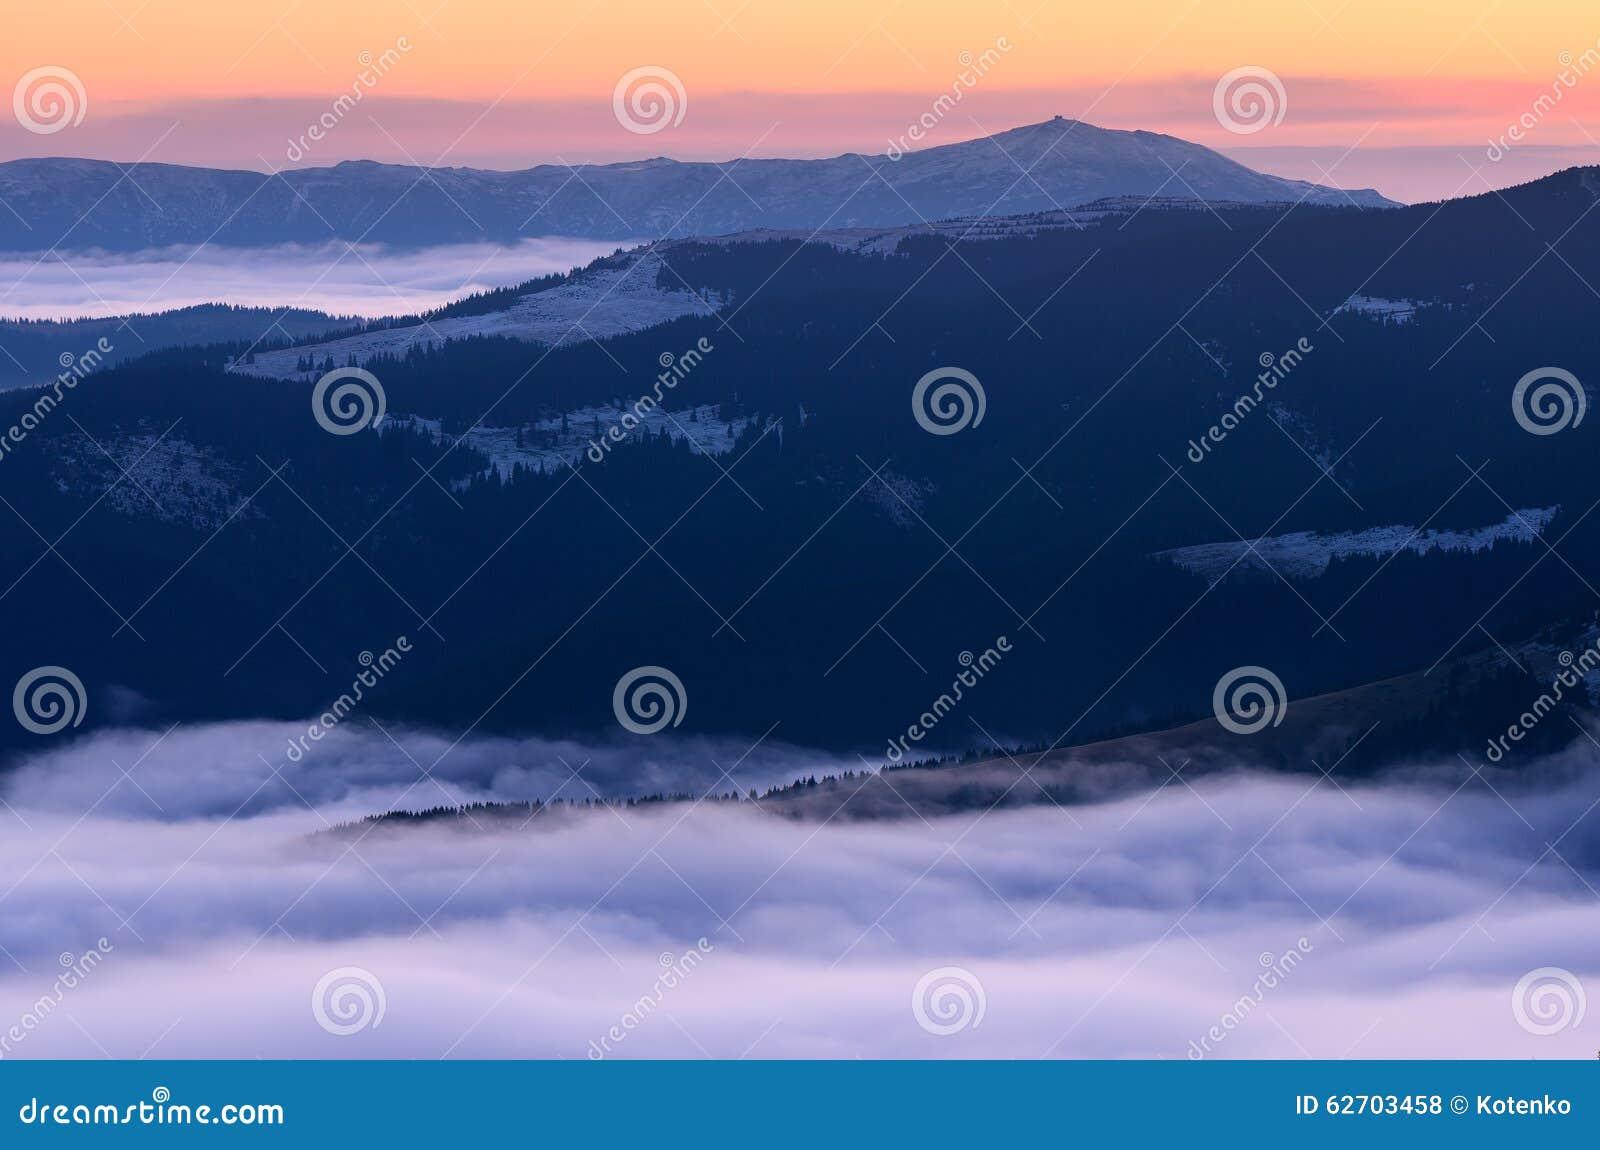 Carpathians τα βουνά ληφθείς εικόνα Ουκρανός αυγής ήταν